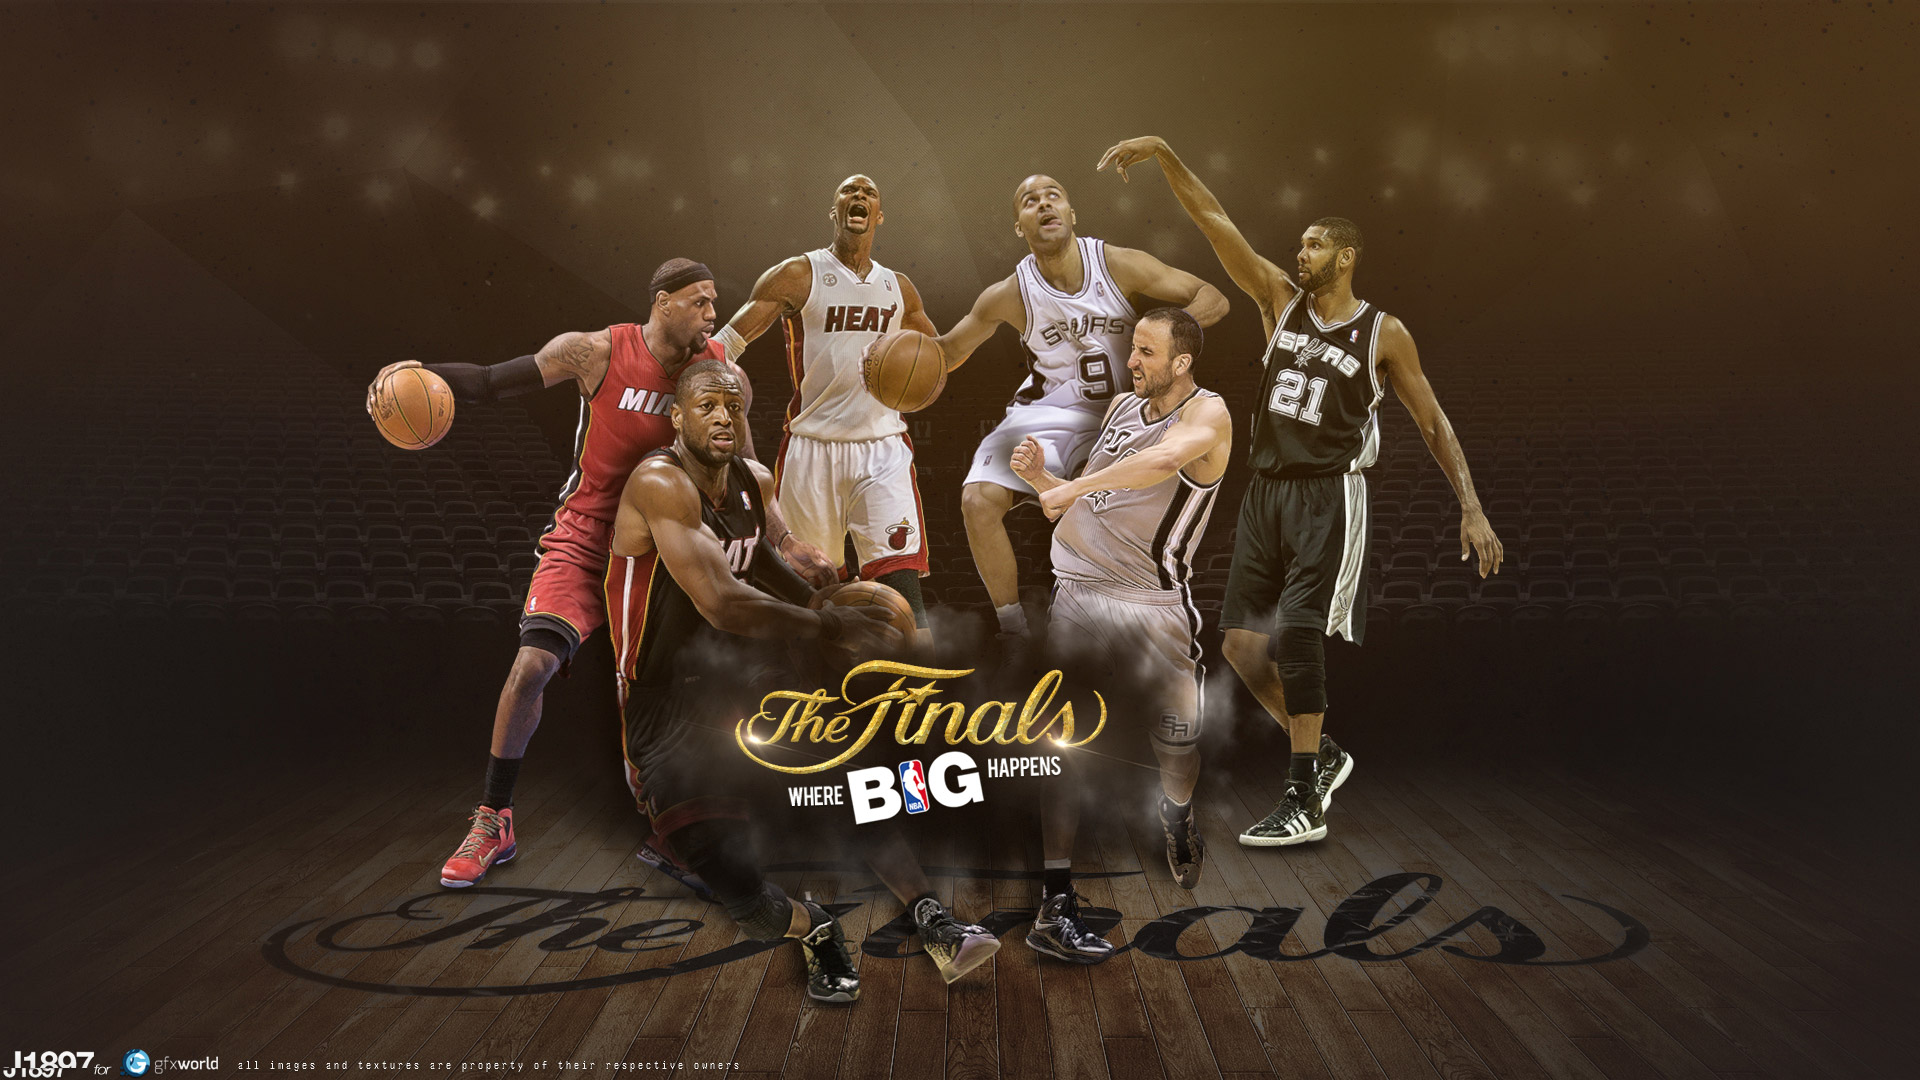 Team Players Nba Wallpaper - Miami Heat Championship 4k , HD Wallpaper & Backgrounds